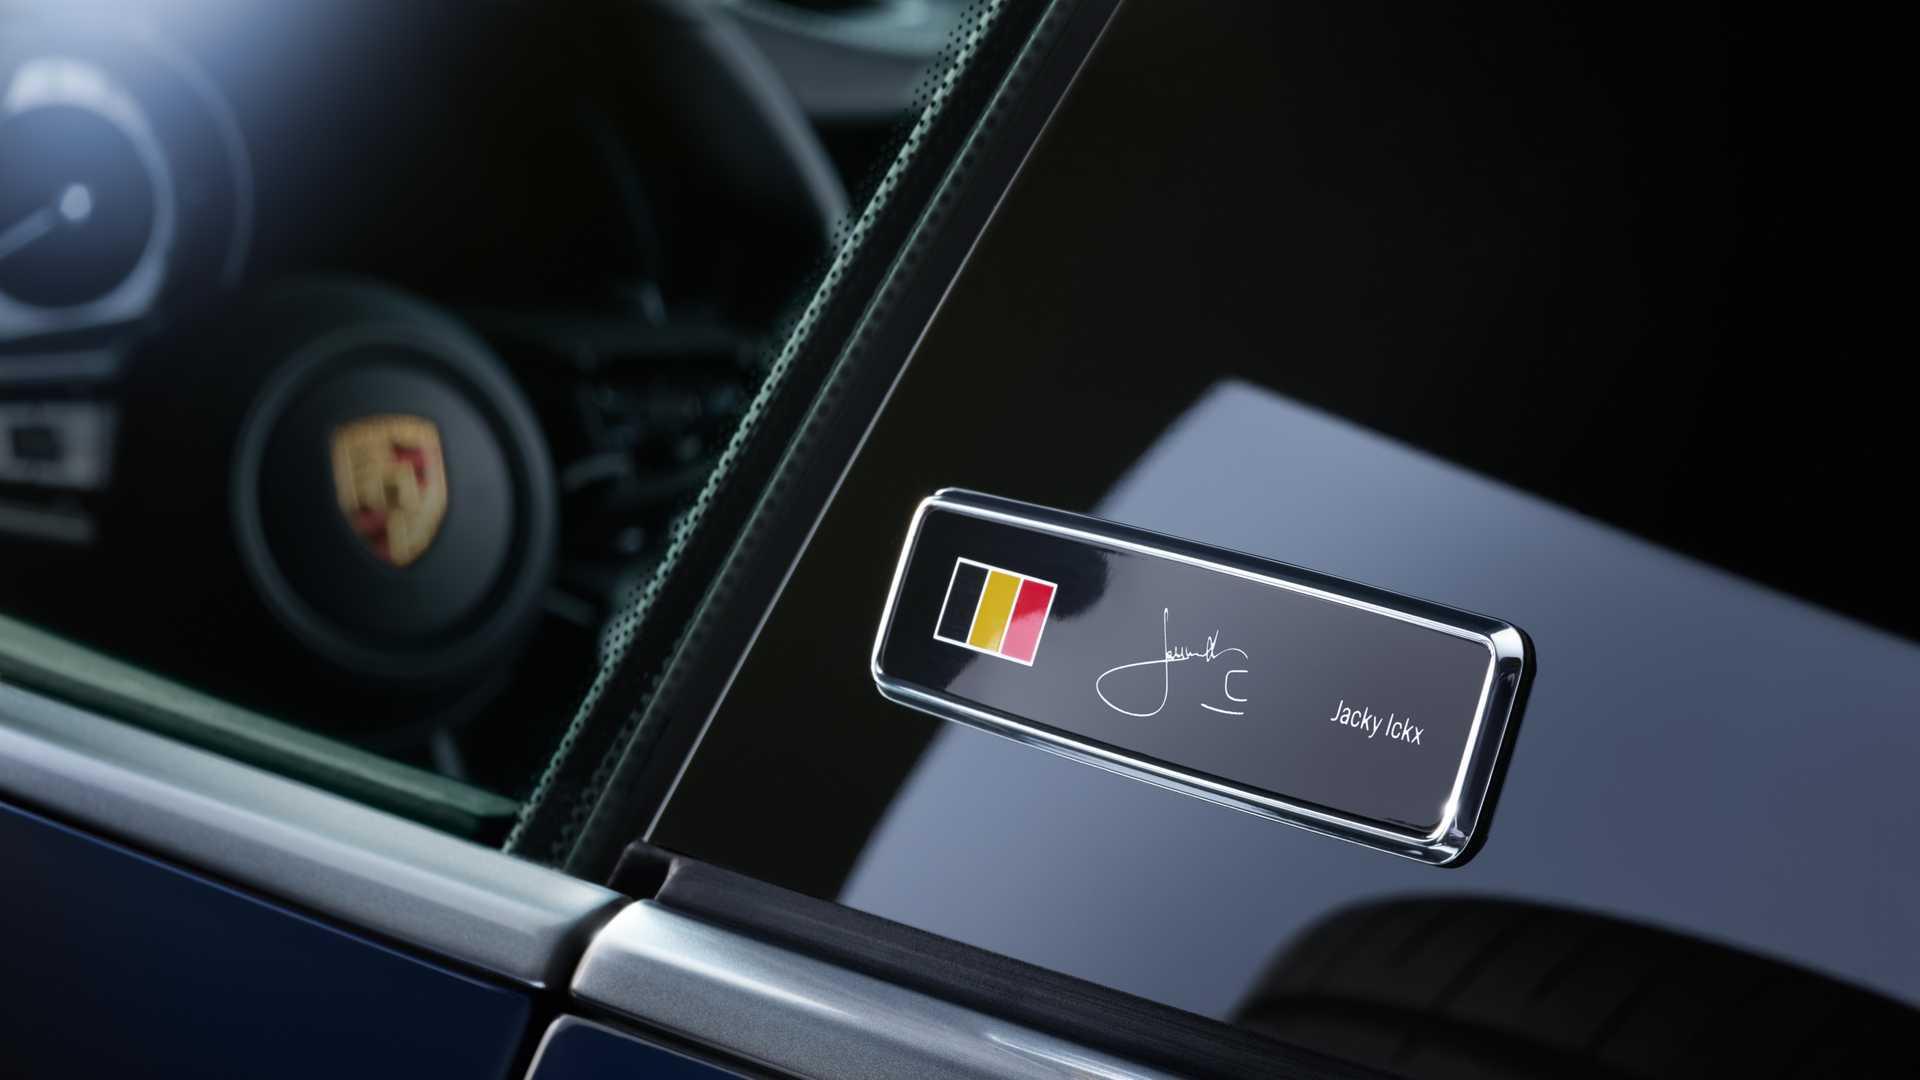 Ra mắt Porsche 911 phiên bản đặc biệt Belgian Legend - 4